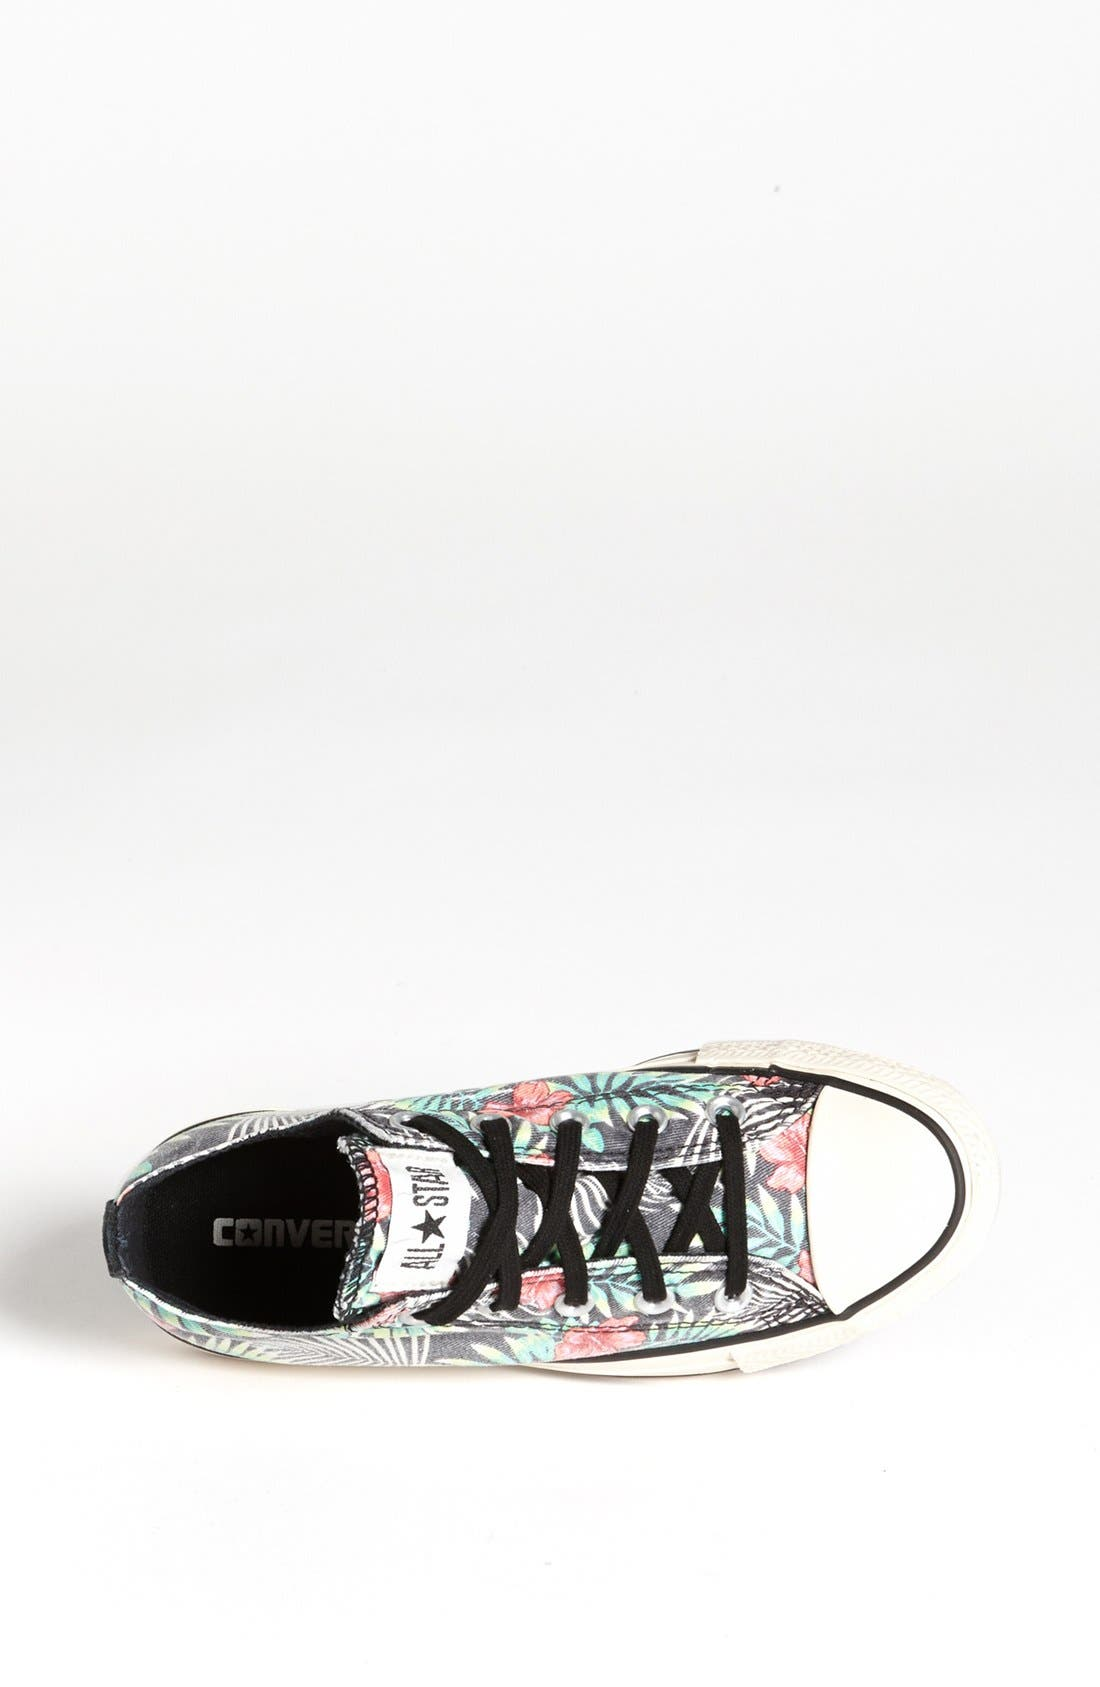 Alternate Image 3  - Converse Chuck Taylor® All Star® 'Florida Keys' Sneaker (Women)